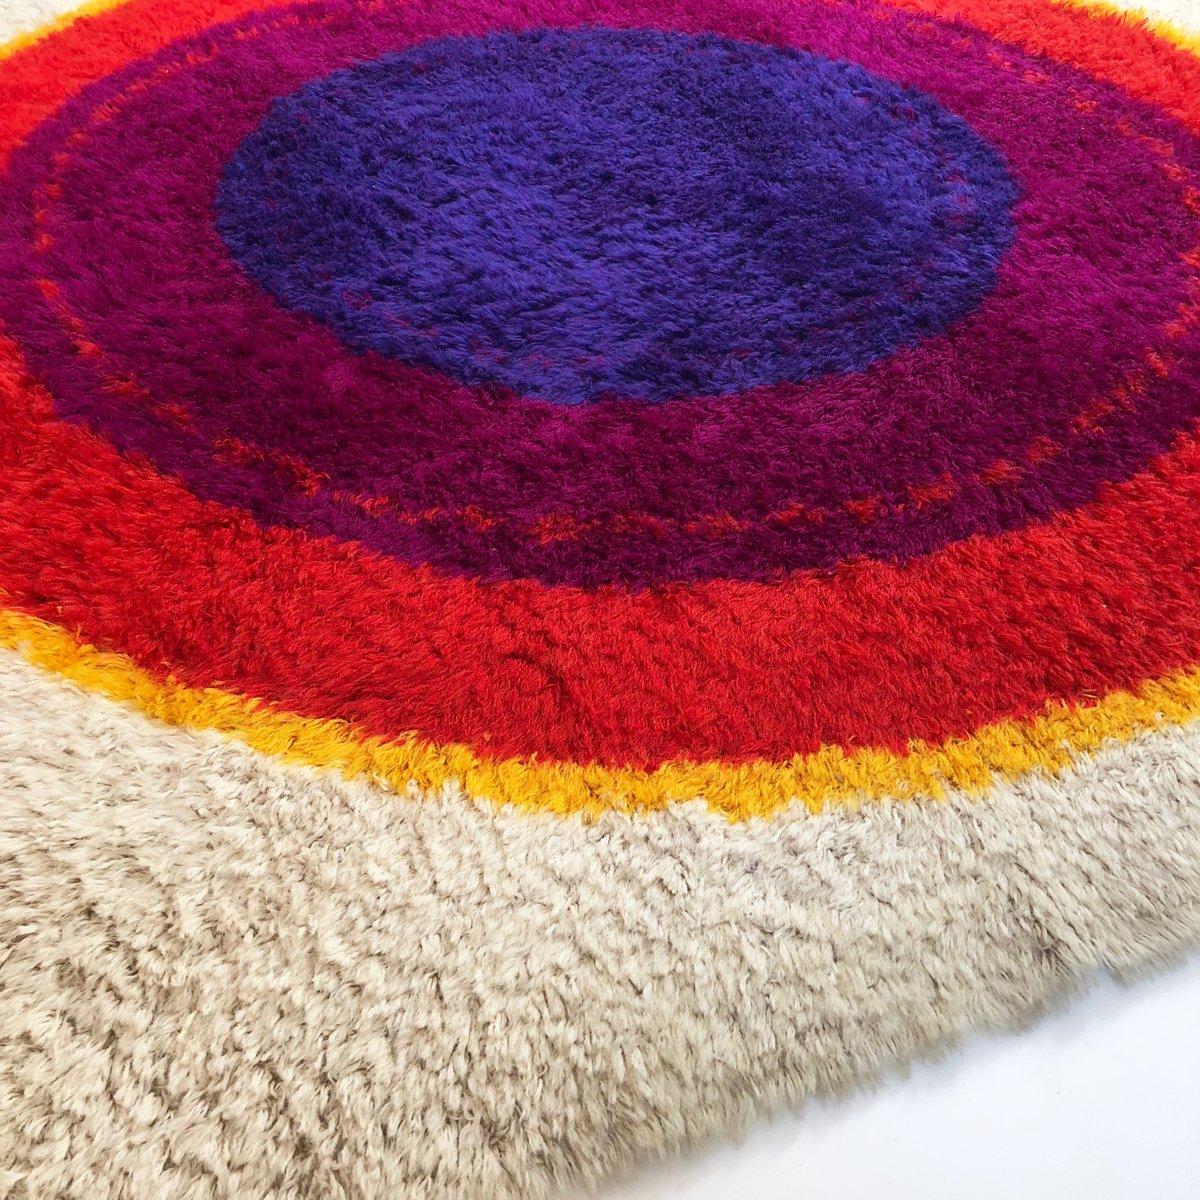 Danish Wool Ring Rya Rug From Hojer Eksport Wilton, 1960s